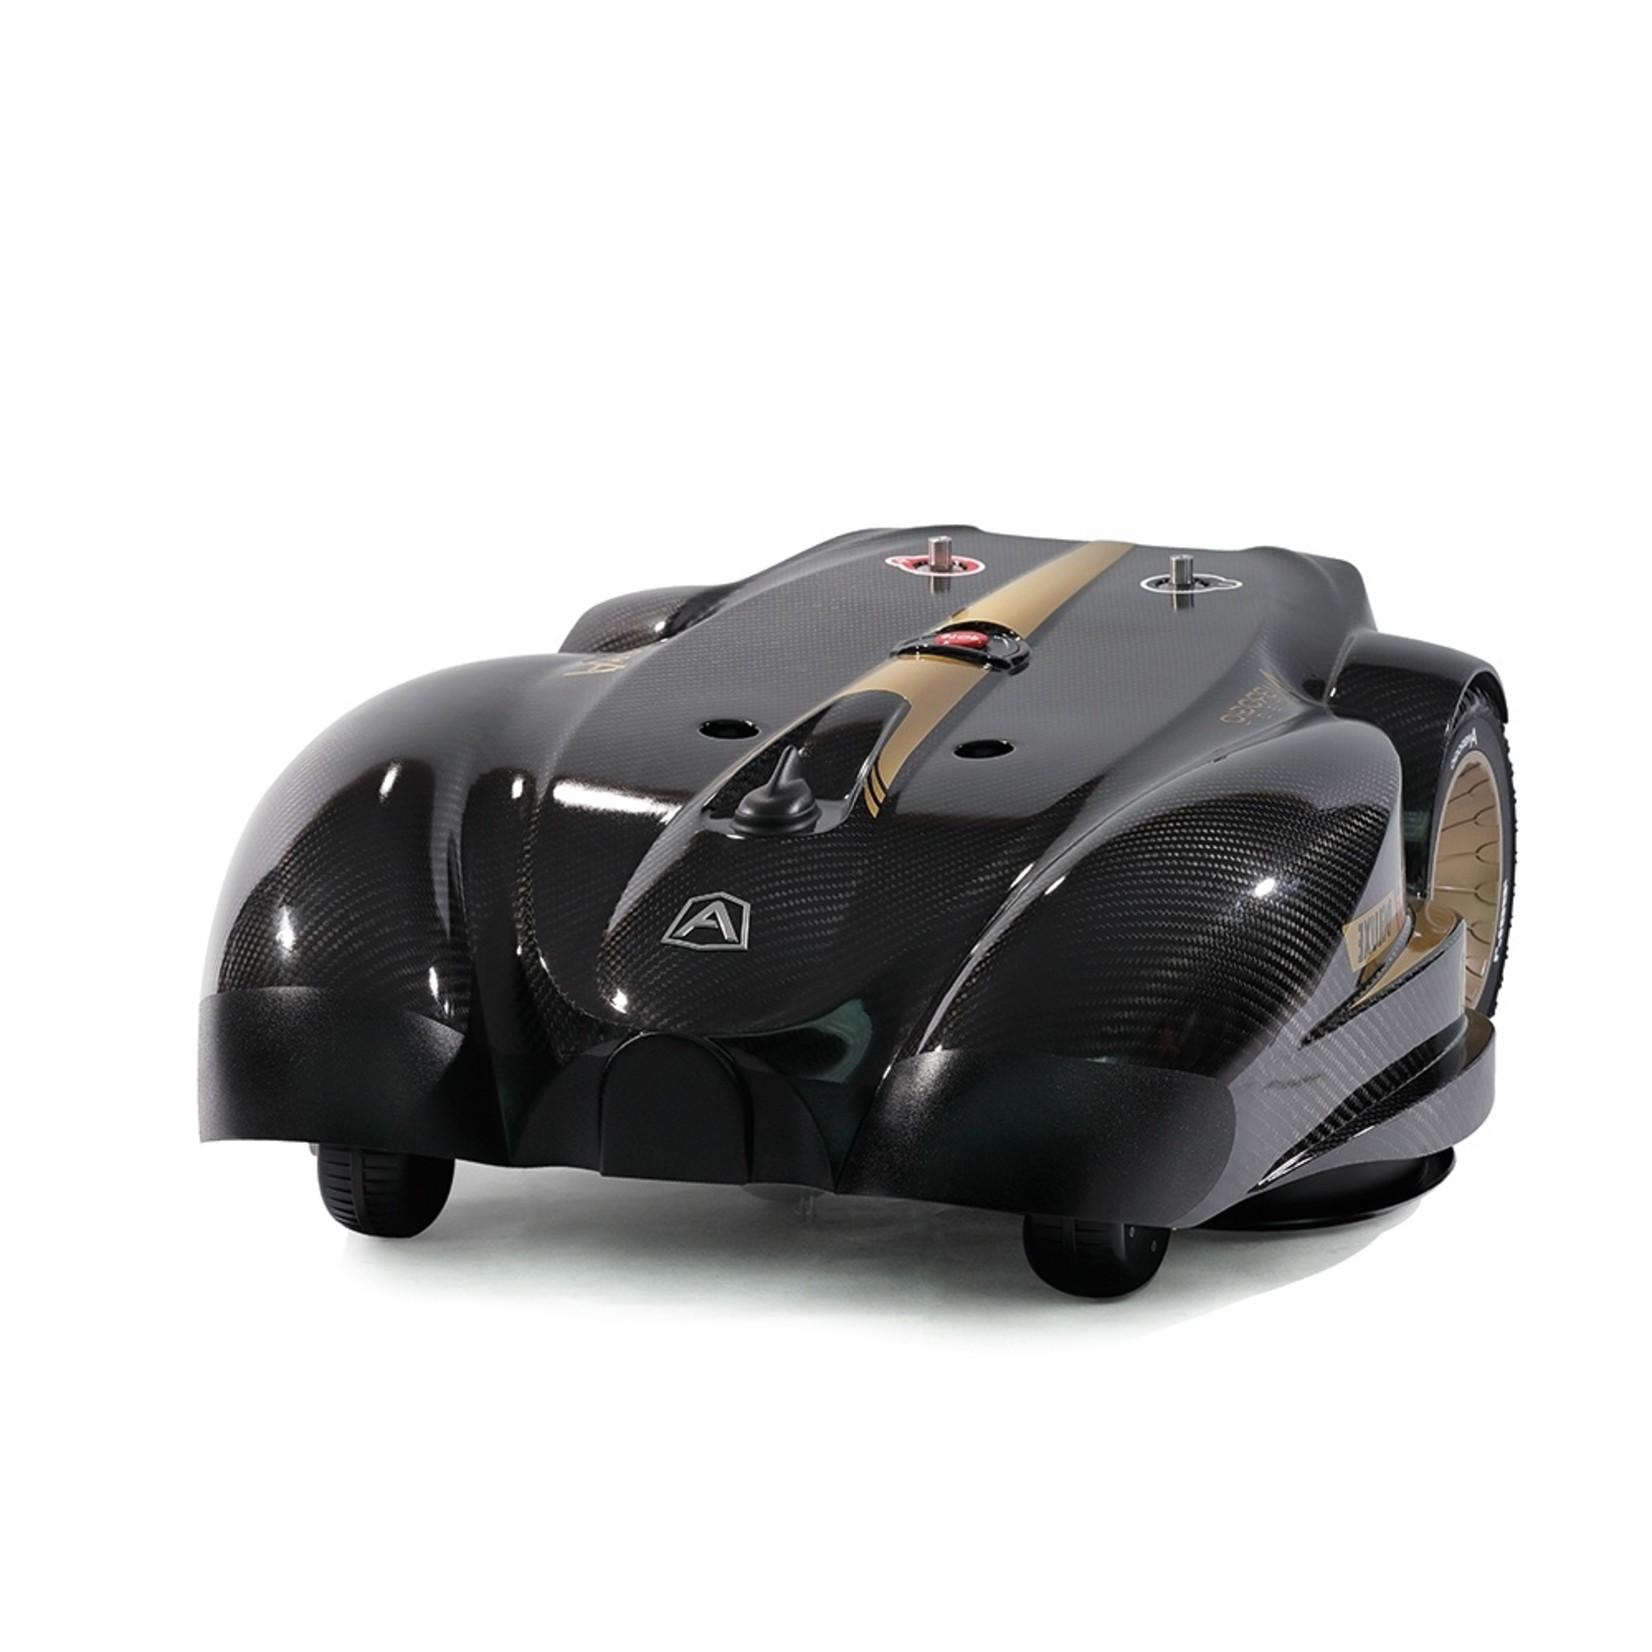 Ambrogio Ambrogio Proline L400i Basic Rasenmähroboter Modell 2021